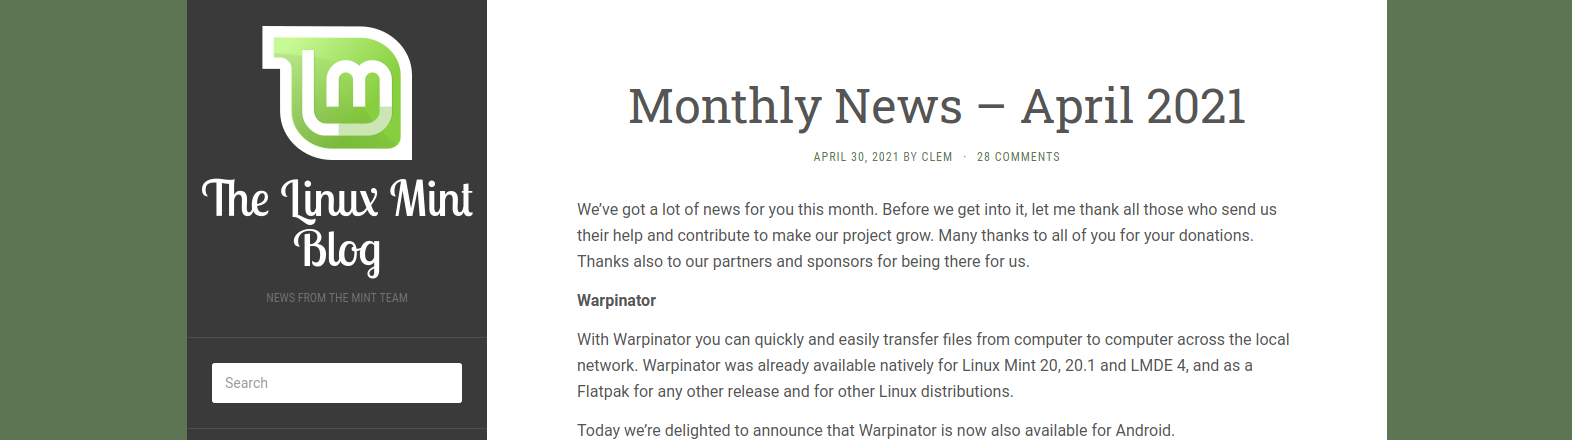 Novità di aprile 2021 su Linux Mint (copertina)